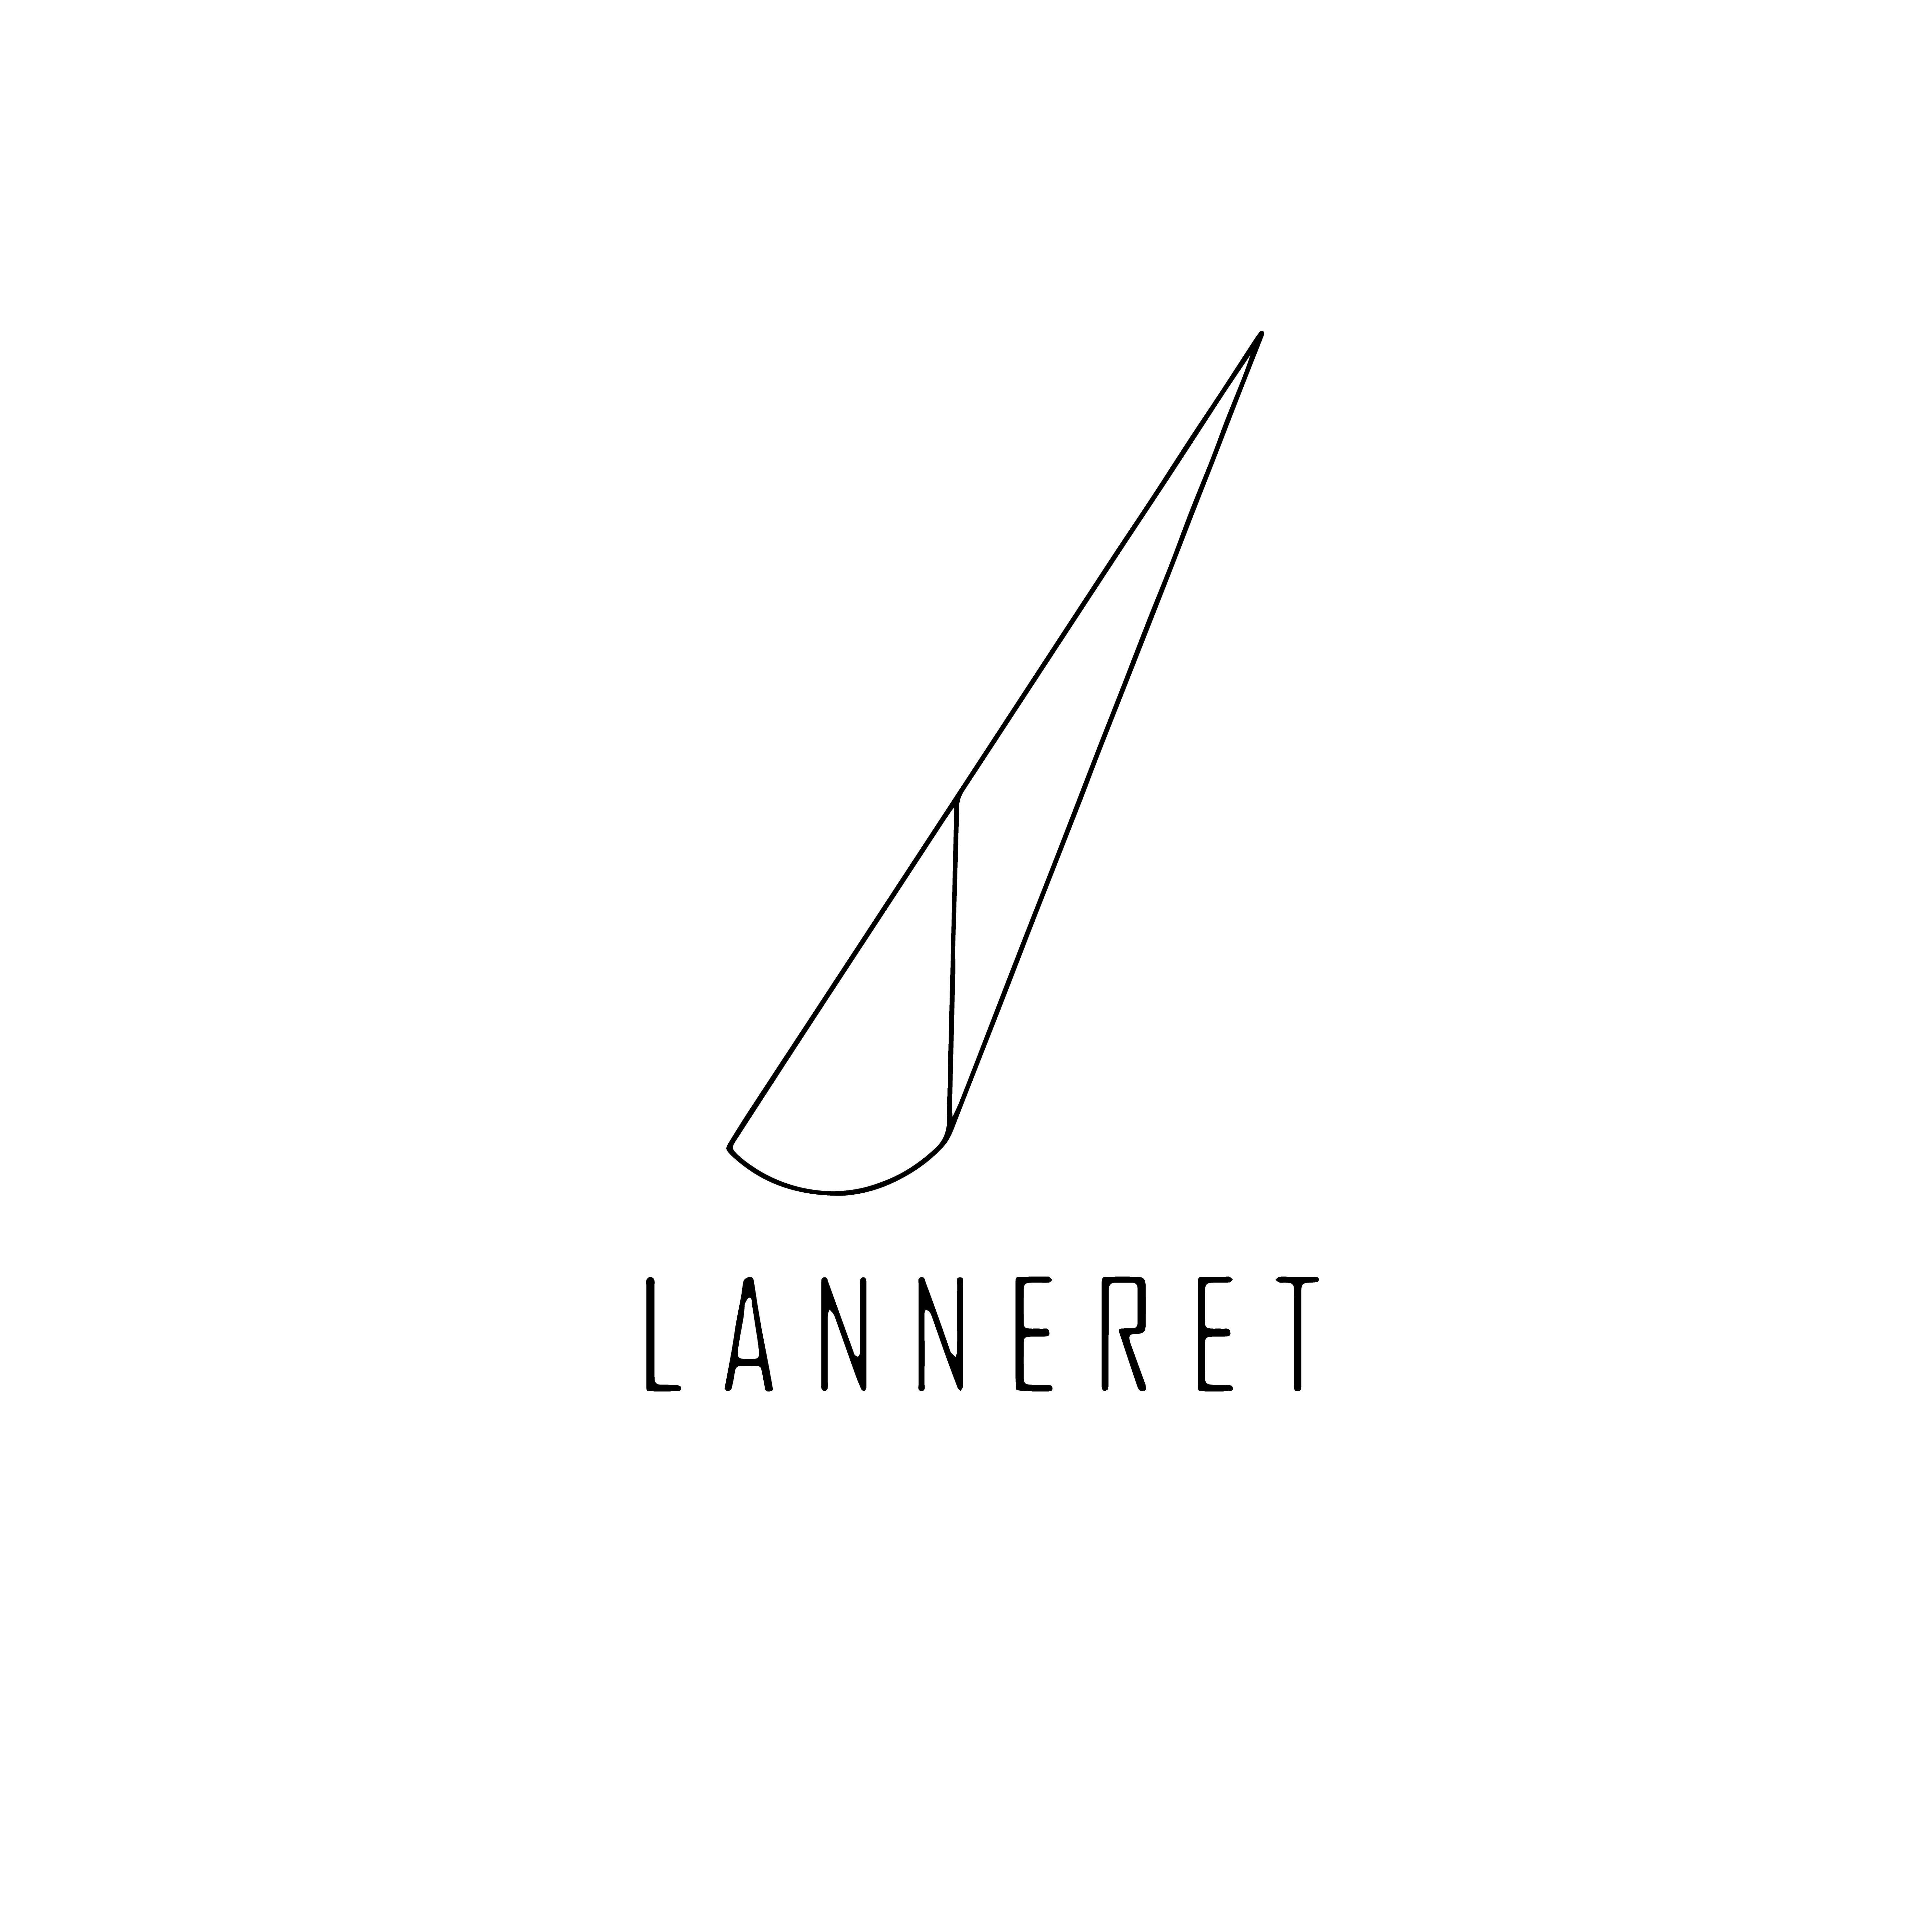 LANNERET